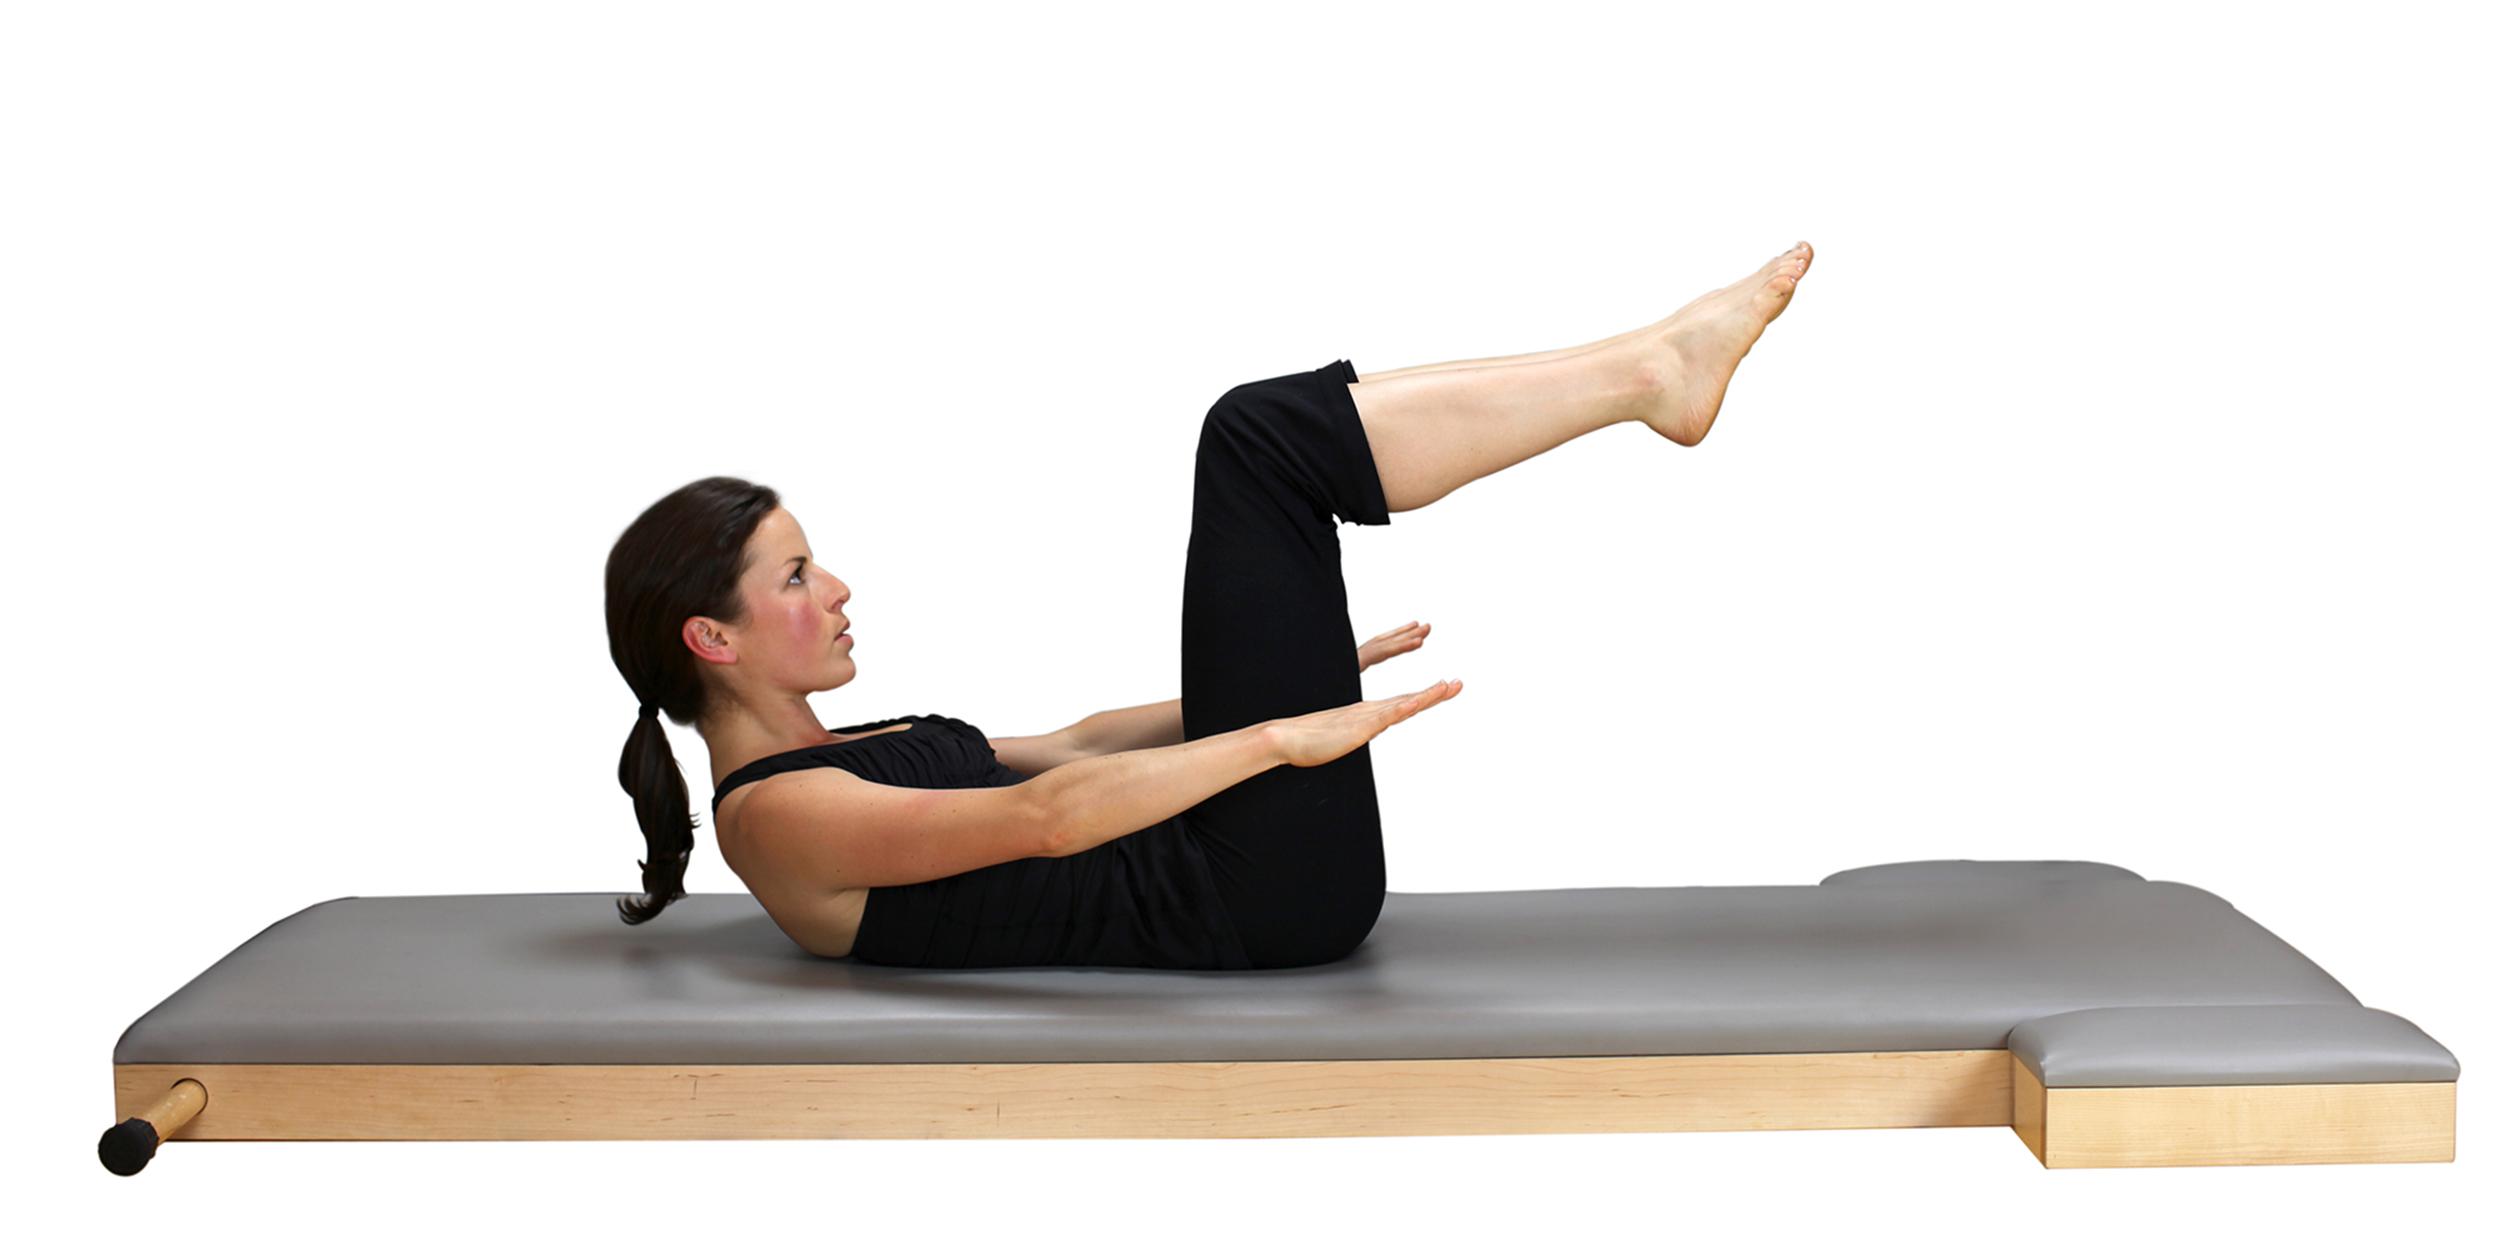 9 Bài Tập Pilates Giảm Cân Hiệu Quả Tại Nhà 1